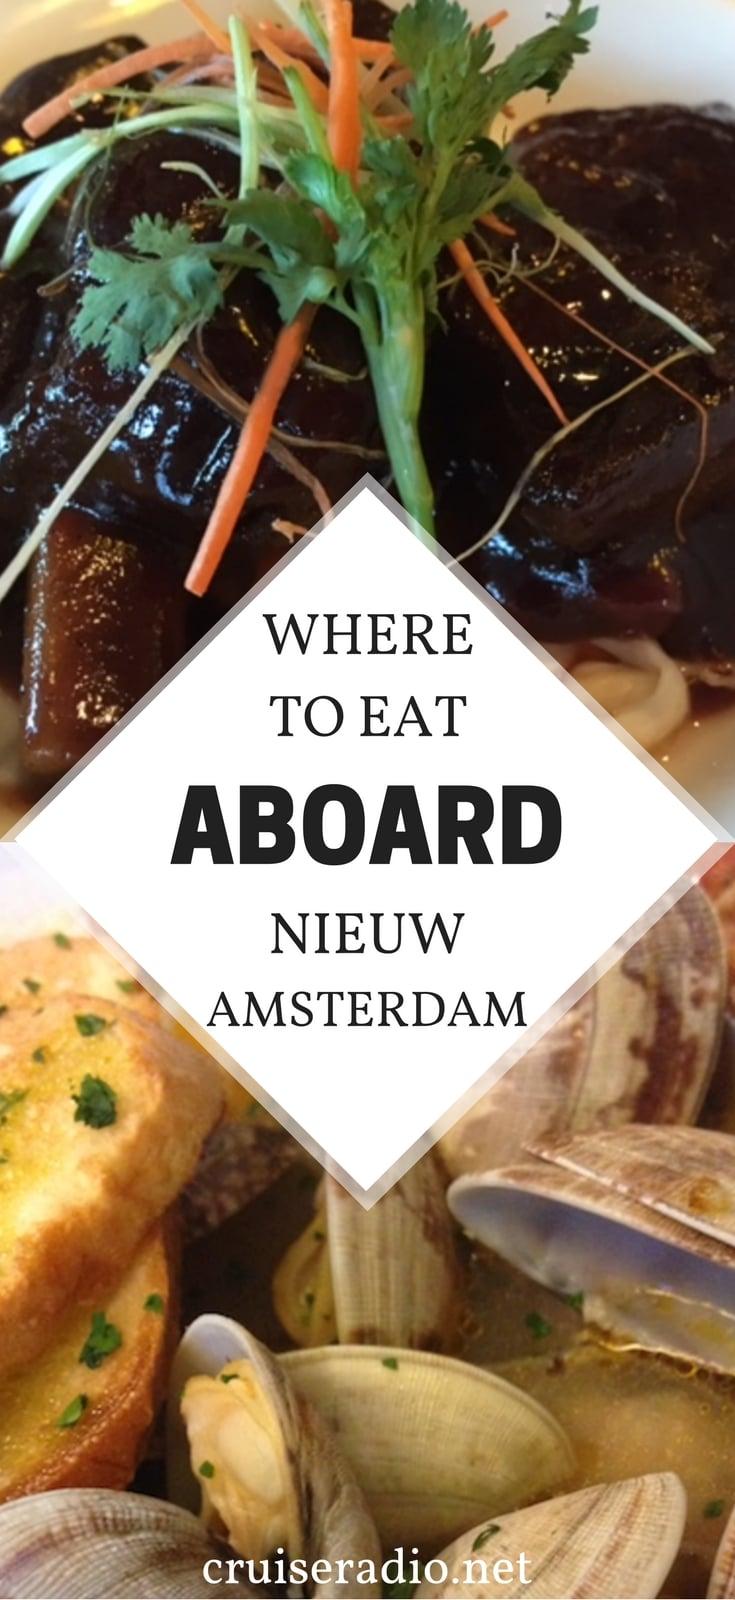 #hollandamerica #nieuwamsterdam #cruise #ship #nautical #food #restaurant #vacation #travel #cruiseline